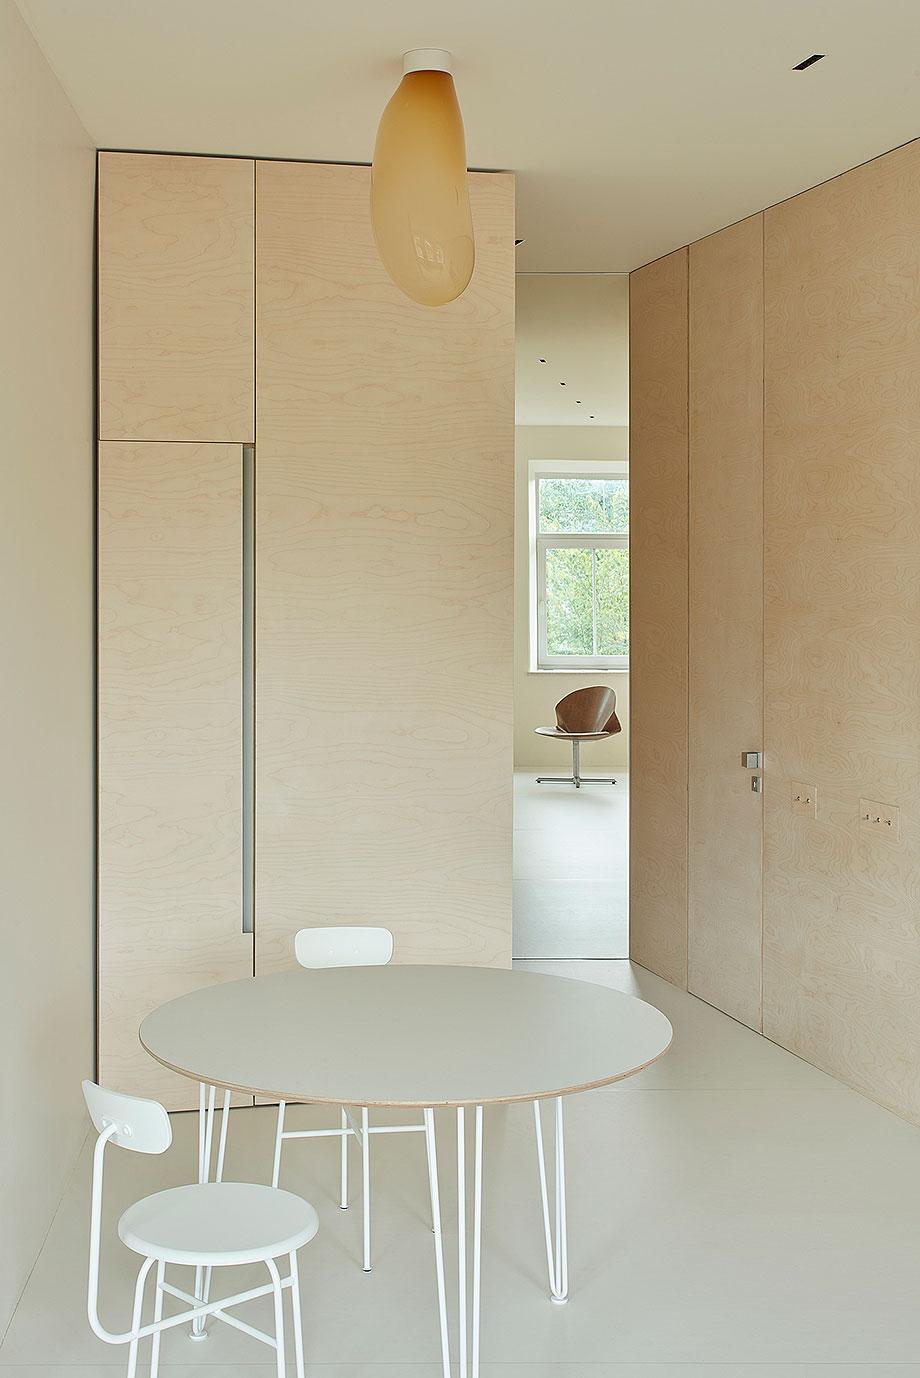 apartamento en vilna de sarkauskai architecture atelier (3) - foto darius petrulaitis